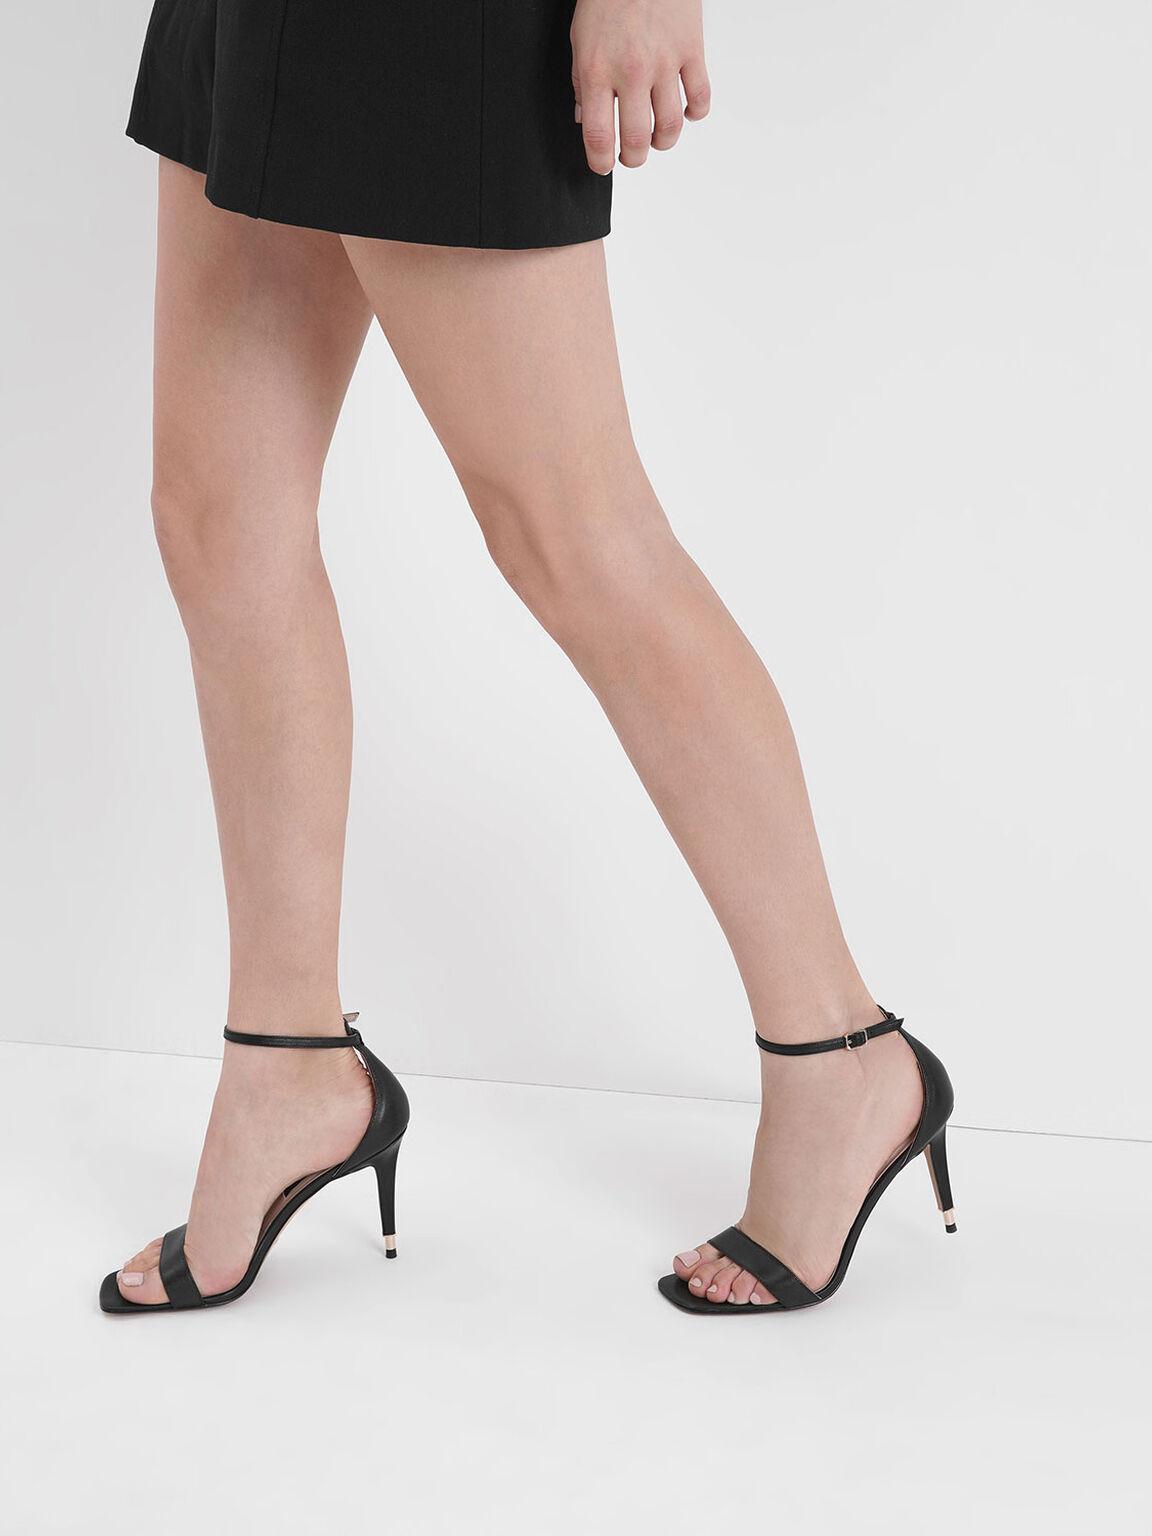 Leather Stiletto Heels, Black, hi-res